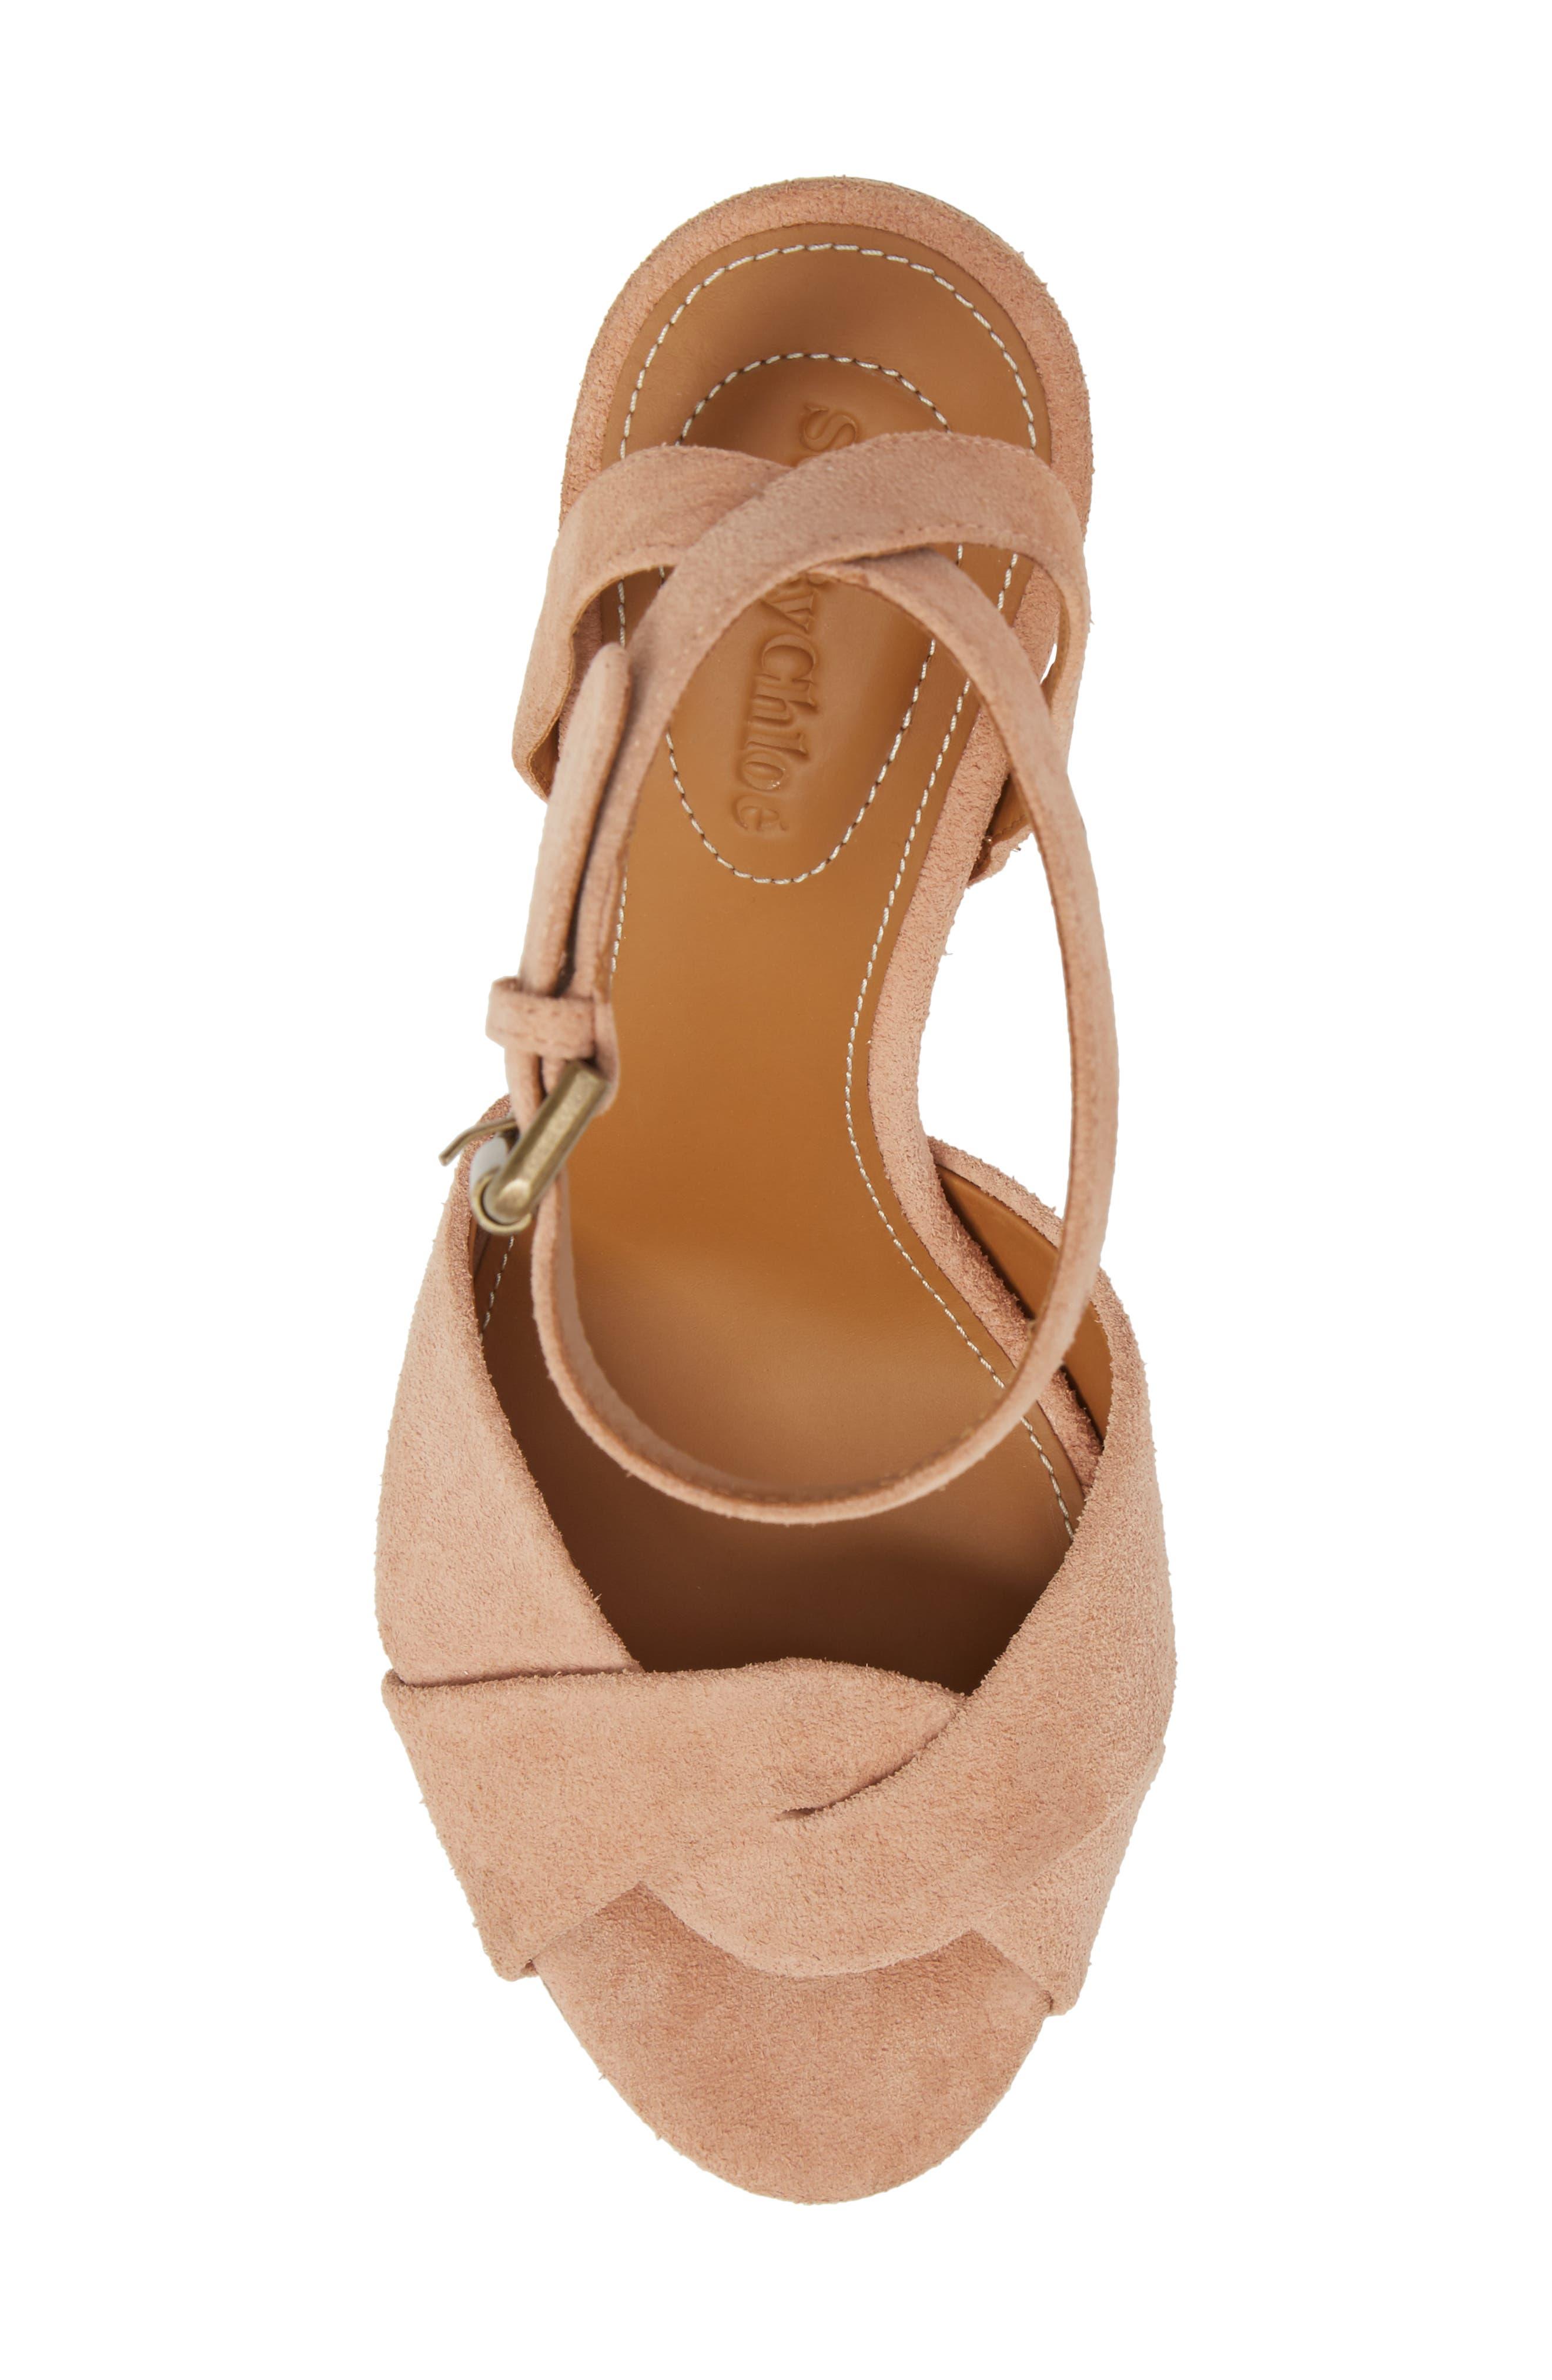 Isida Block Heel Sandal,                             Alternate thumbnail 5, color,                             Cipria